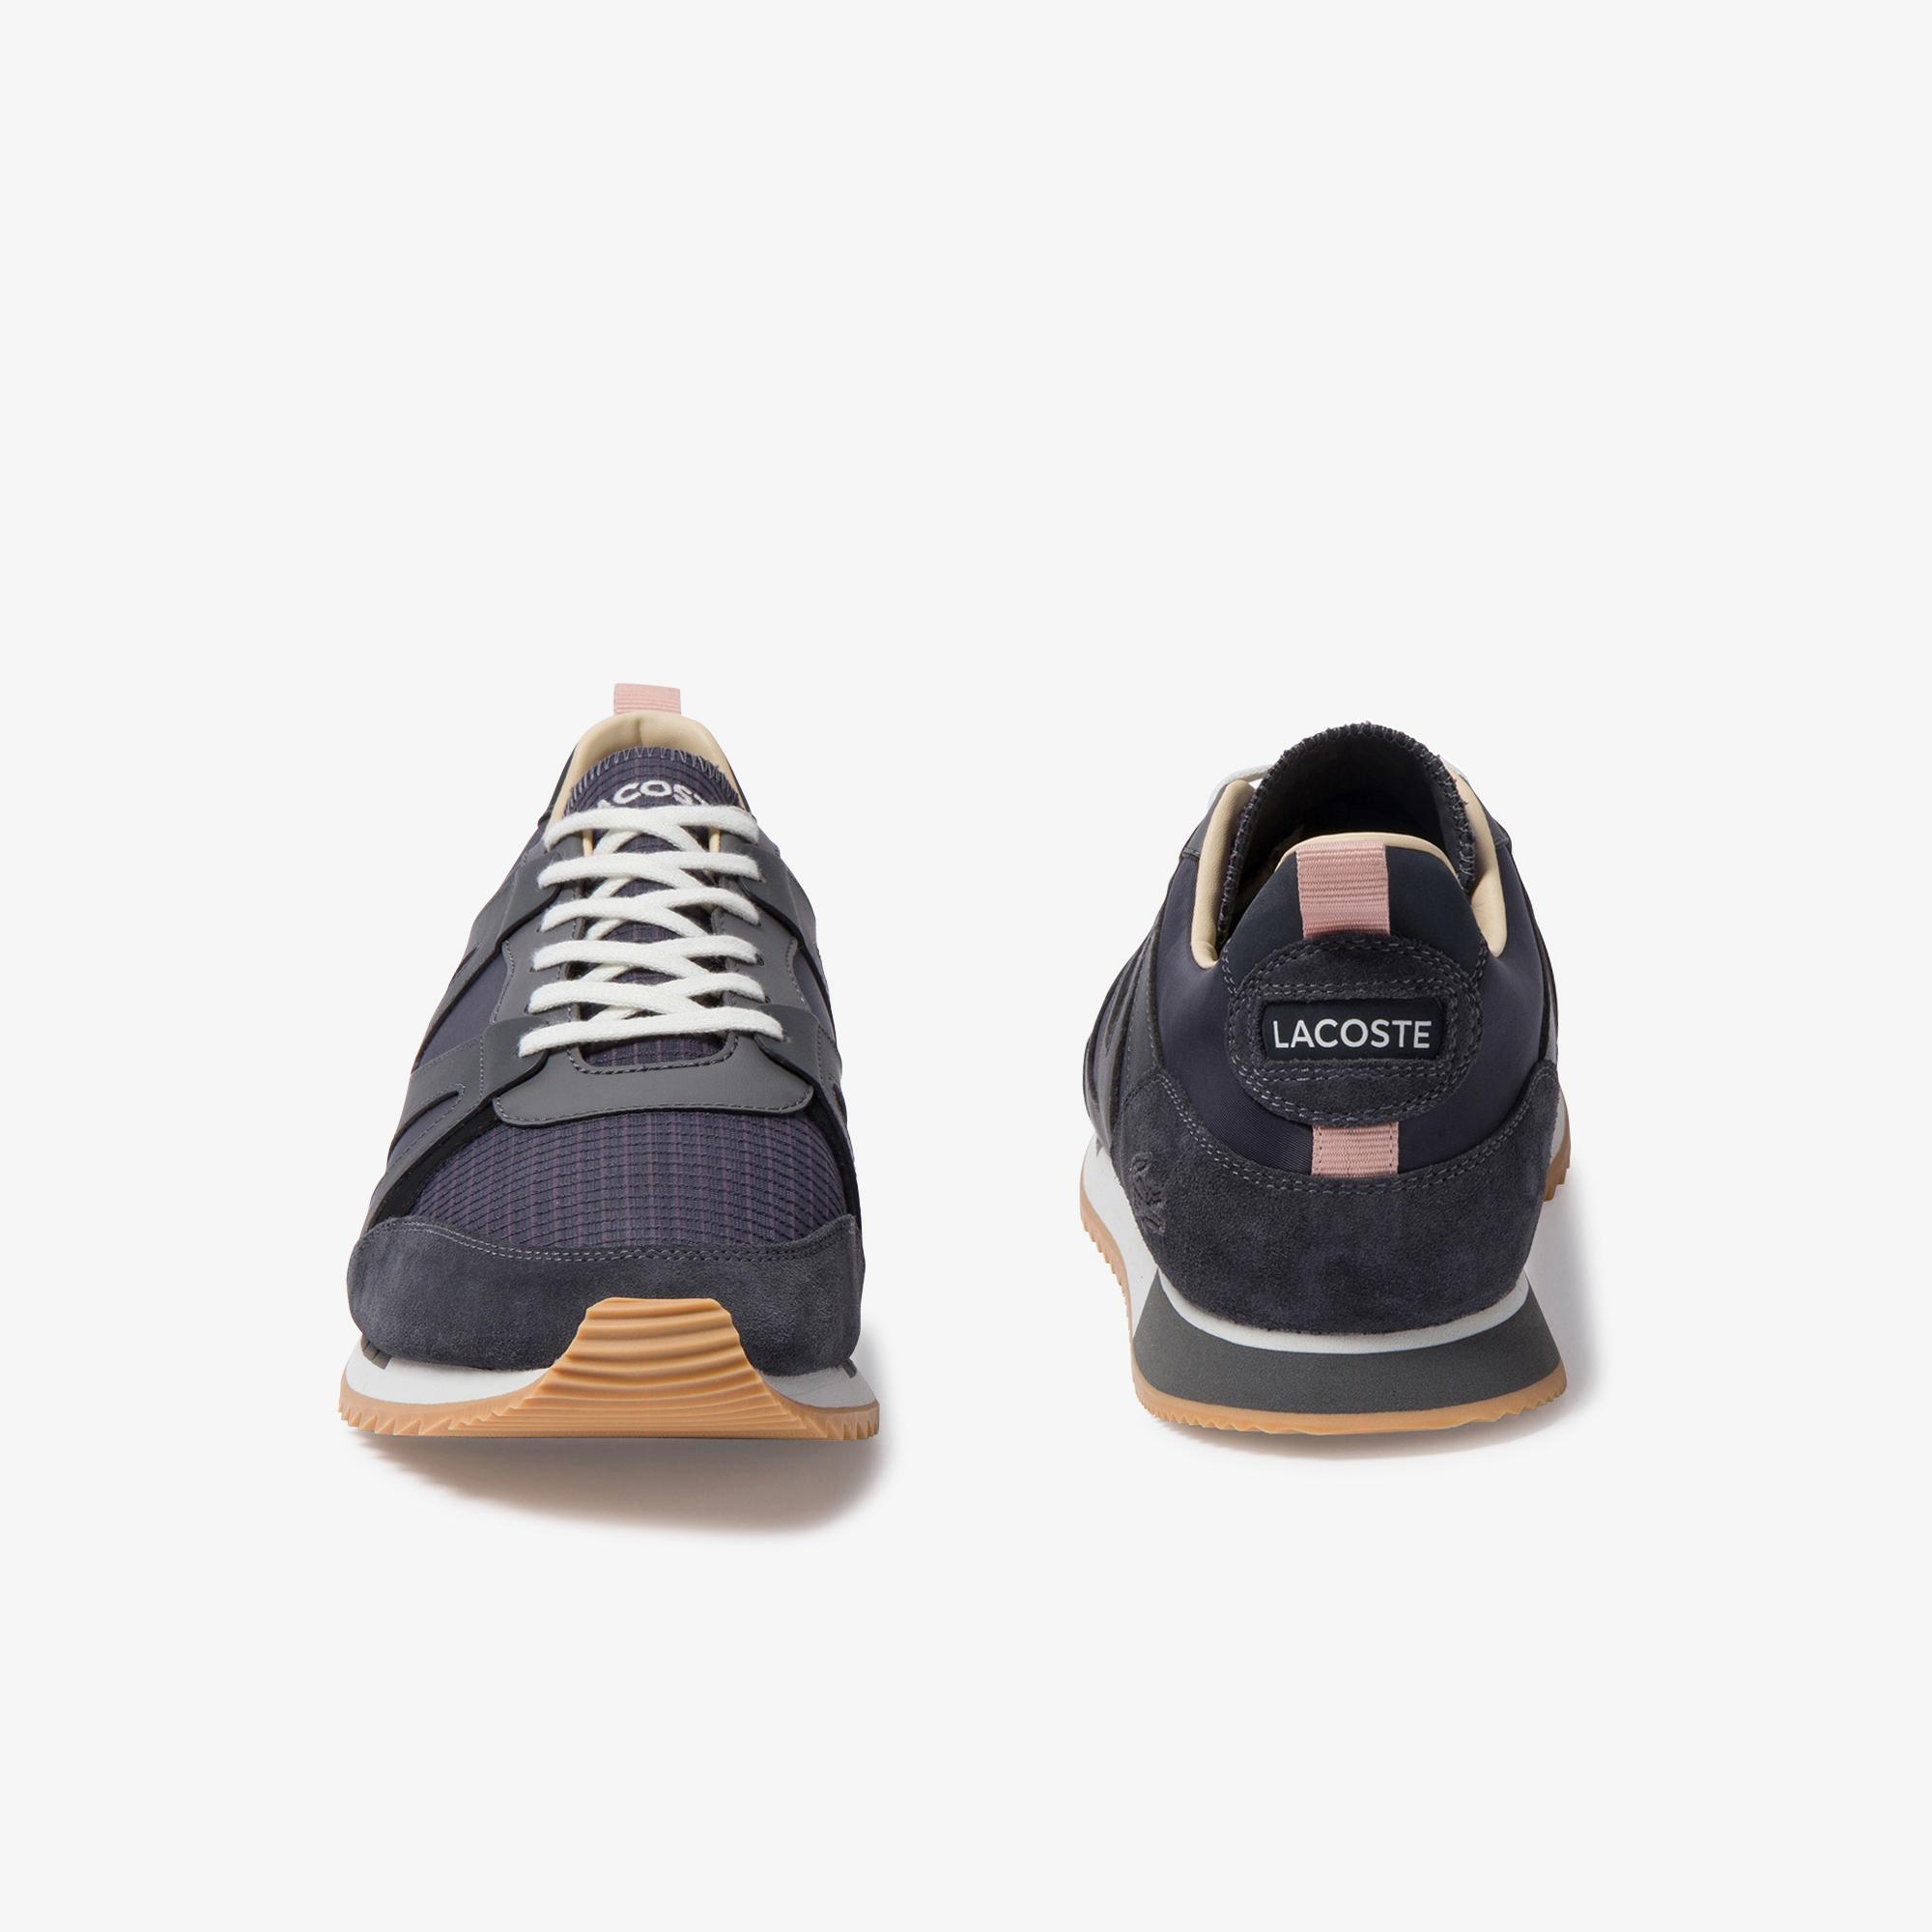 Lacoste Aesthet 120 3 Sma Erkek Koyu Gri - Siyah Deri Sneaker